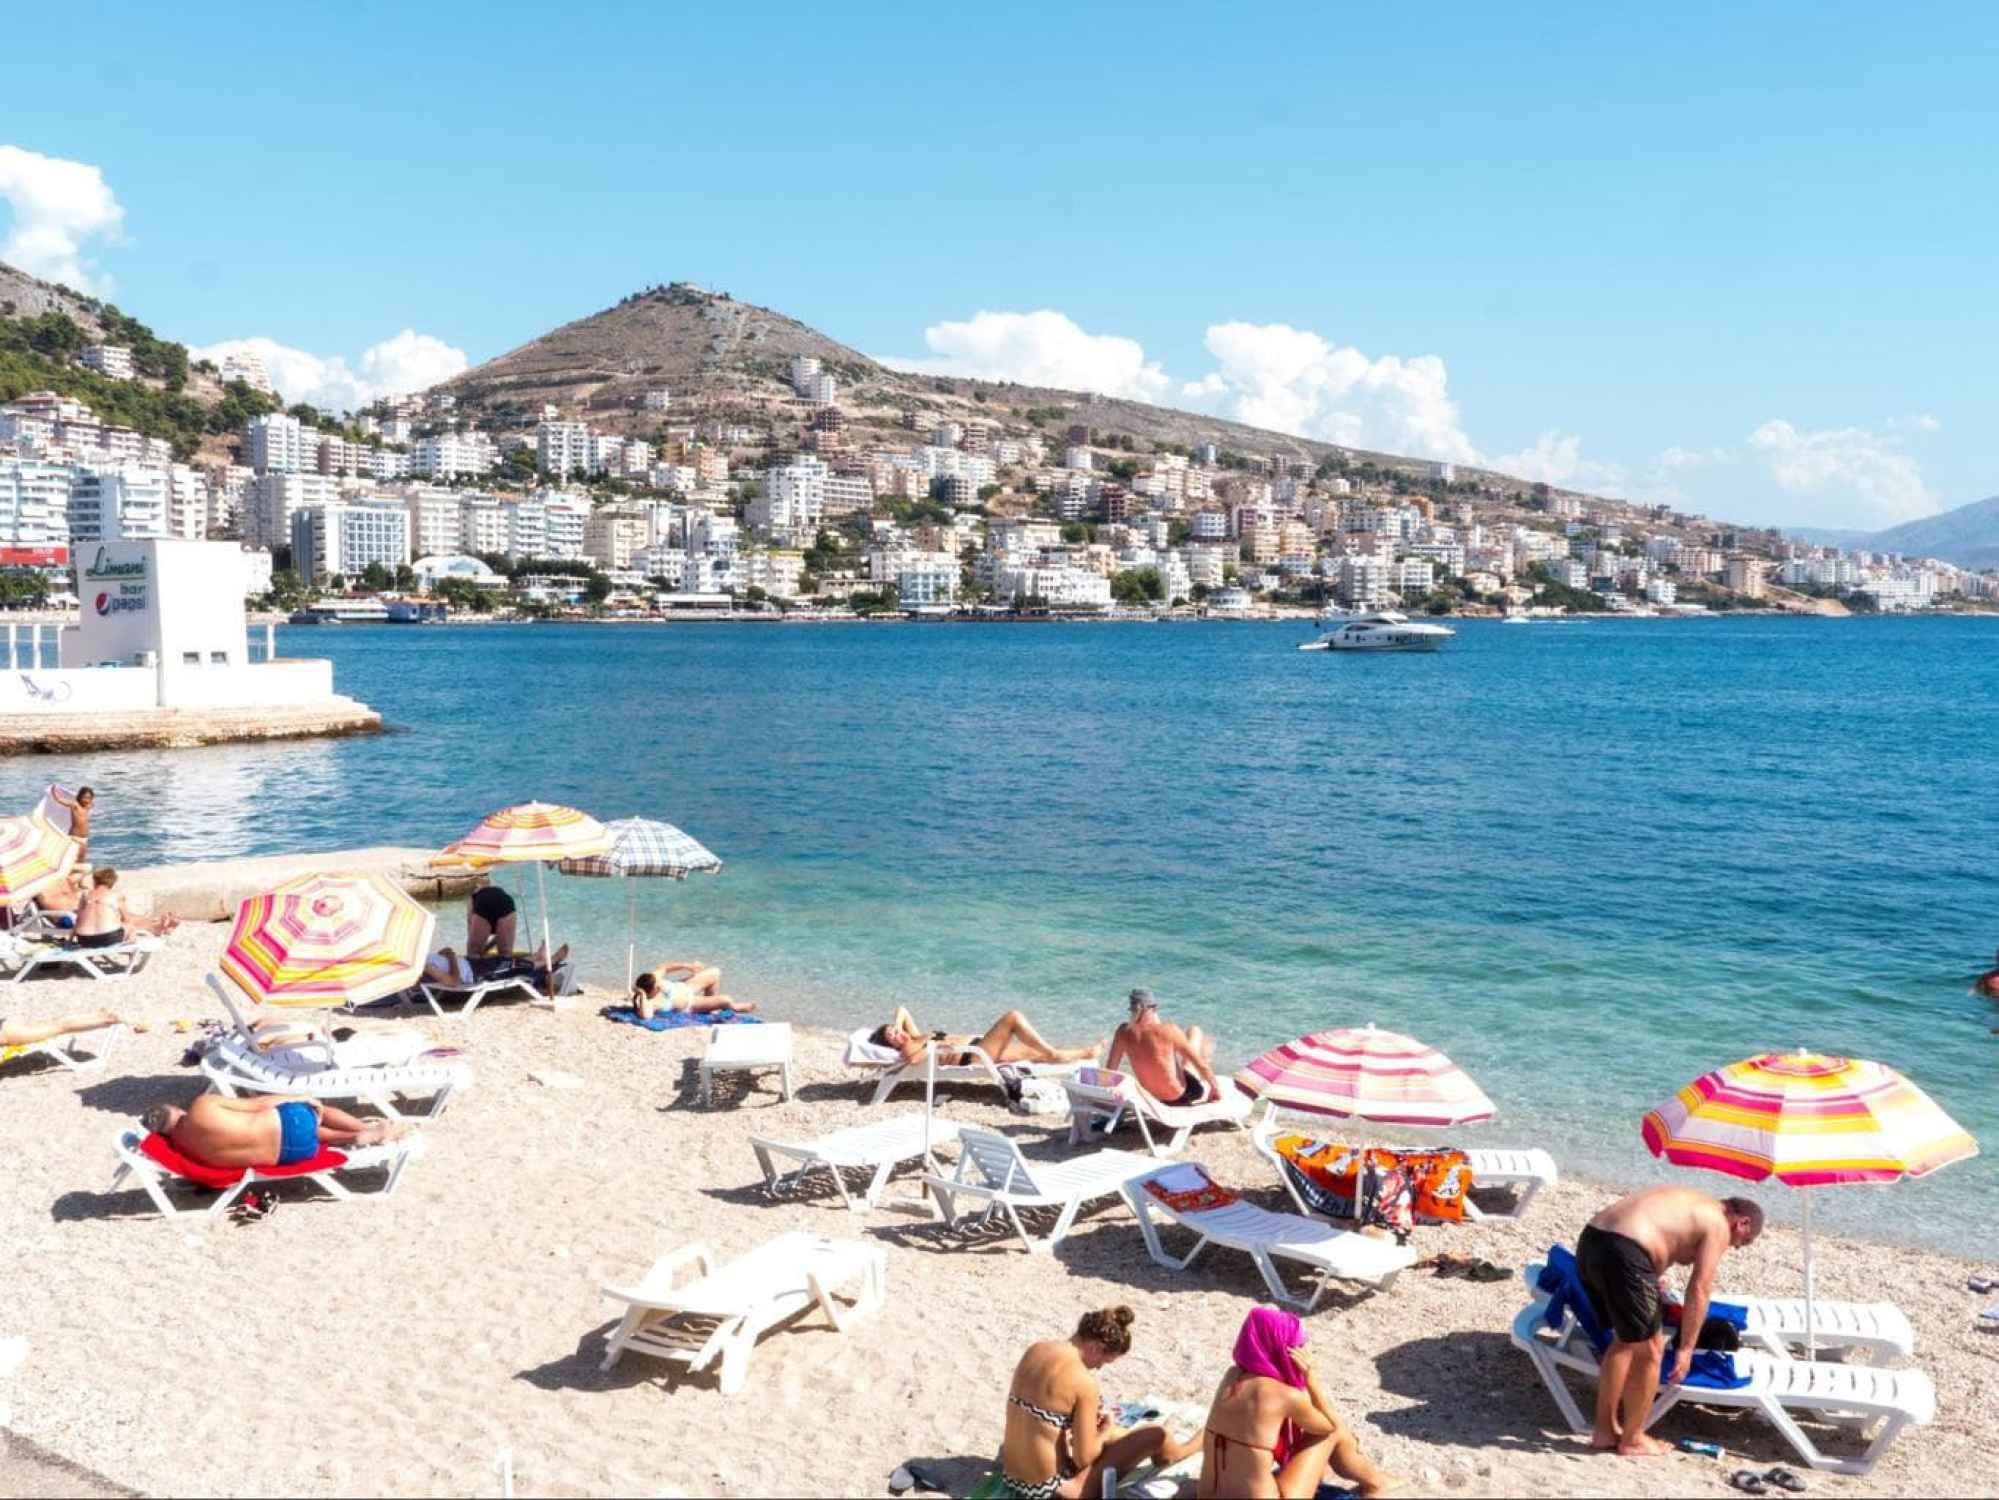 The beach in Saranda, one of the most popular beaches in Albania